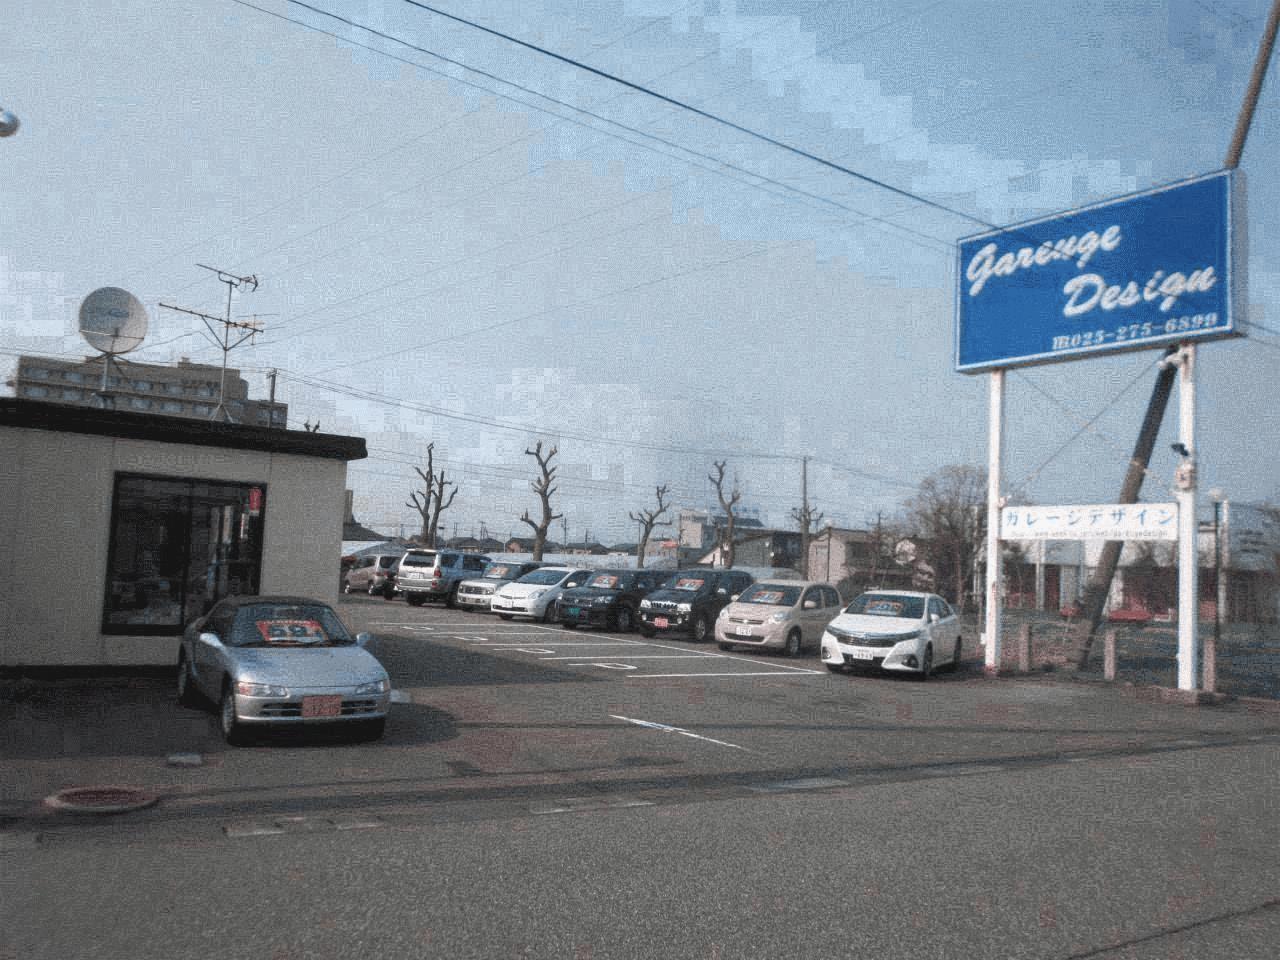 Gareuge Design (有)ガレージデザイン